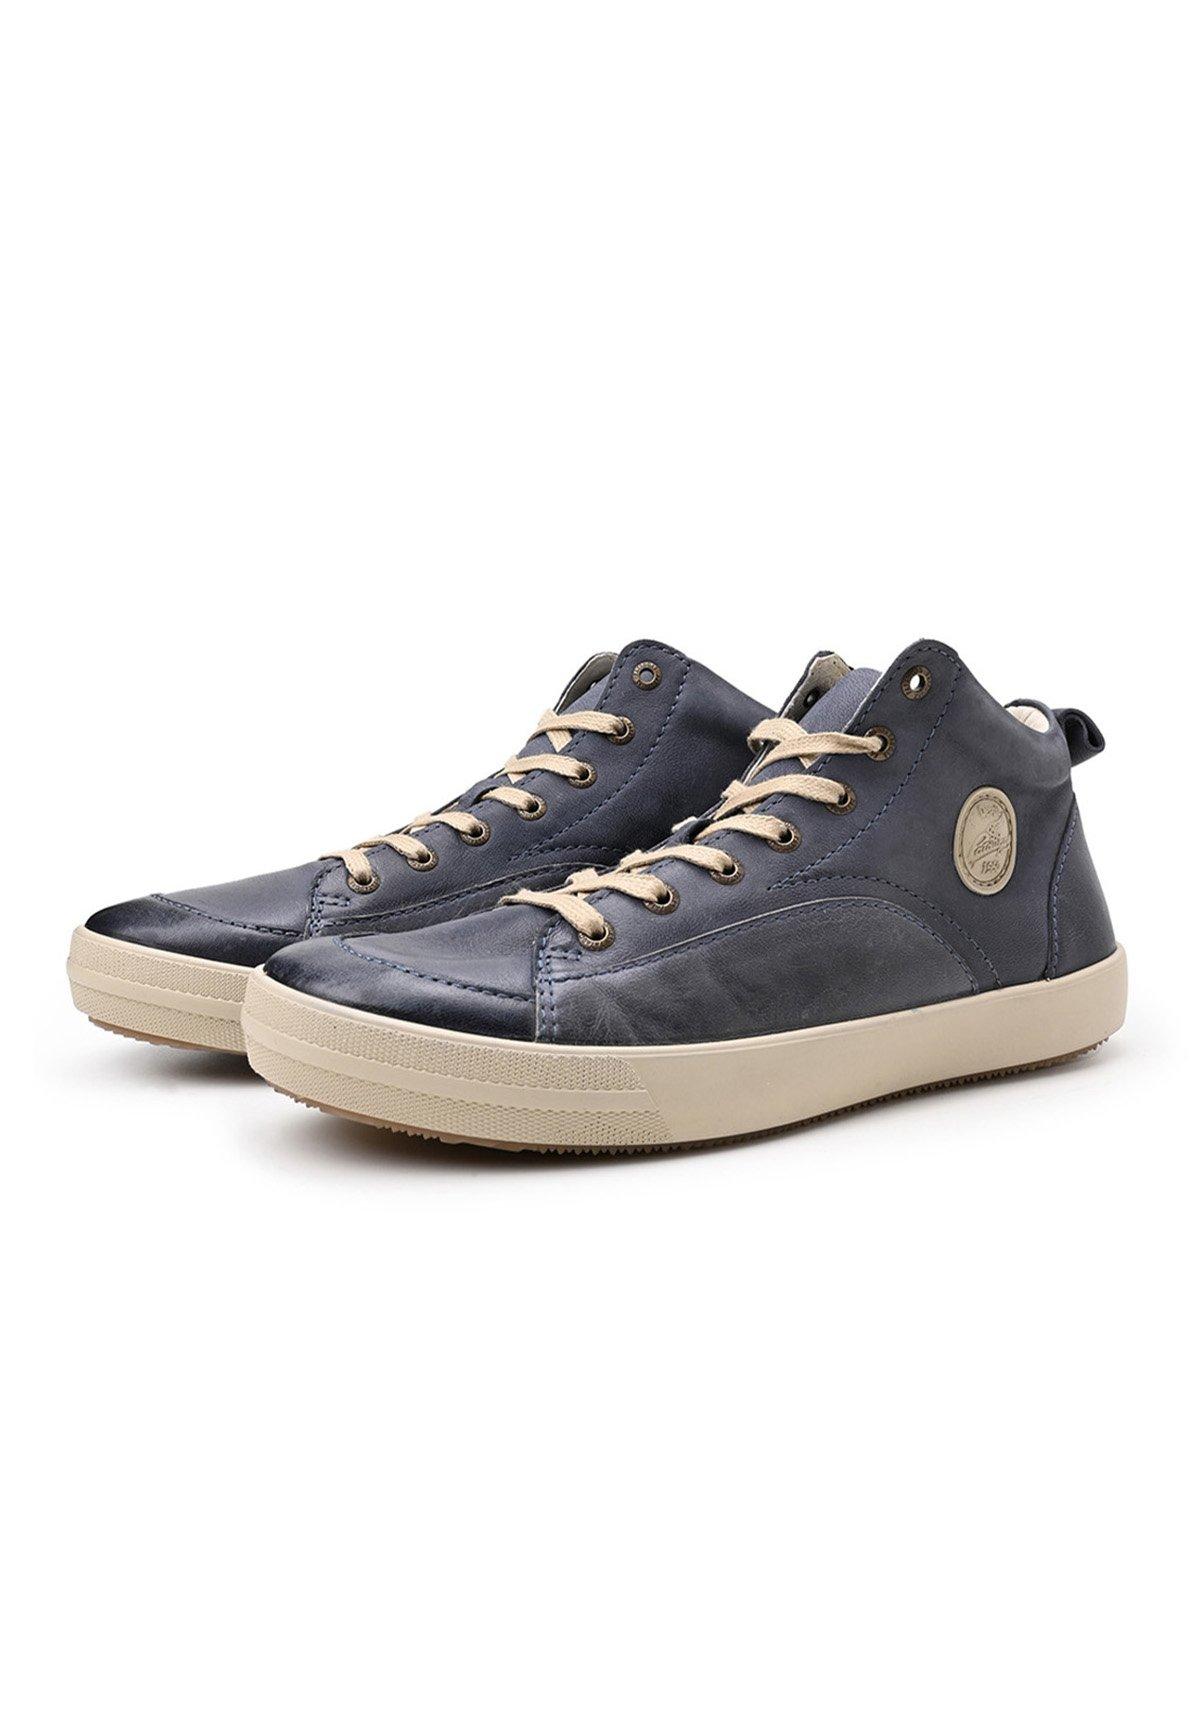 Pataugas CARLO LEATHER  - Sneaker high - dark grey/dunkelgrau - Herrenschuhe zNIMG